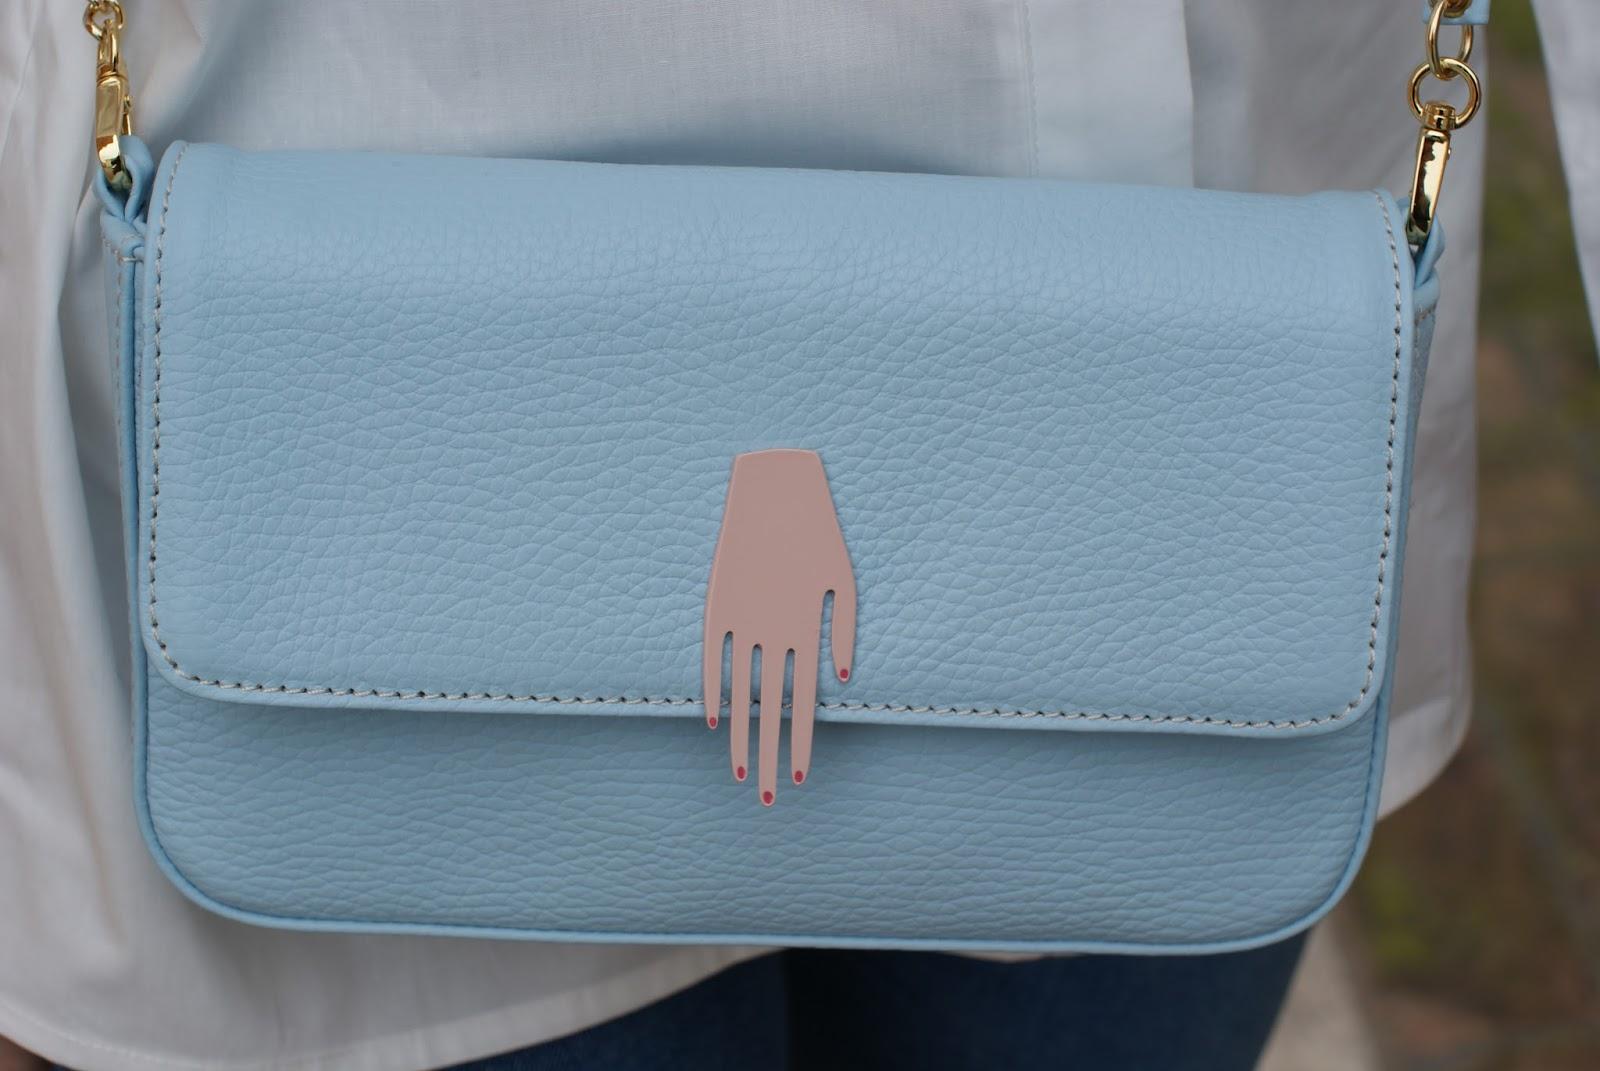 Lazzari store serenity bag on Fashion and Cookies fashion blog, fashion blogger style